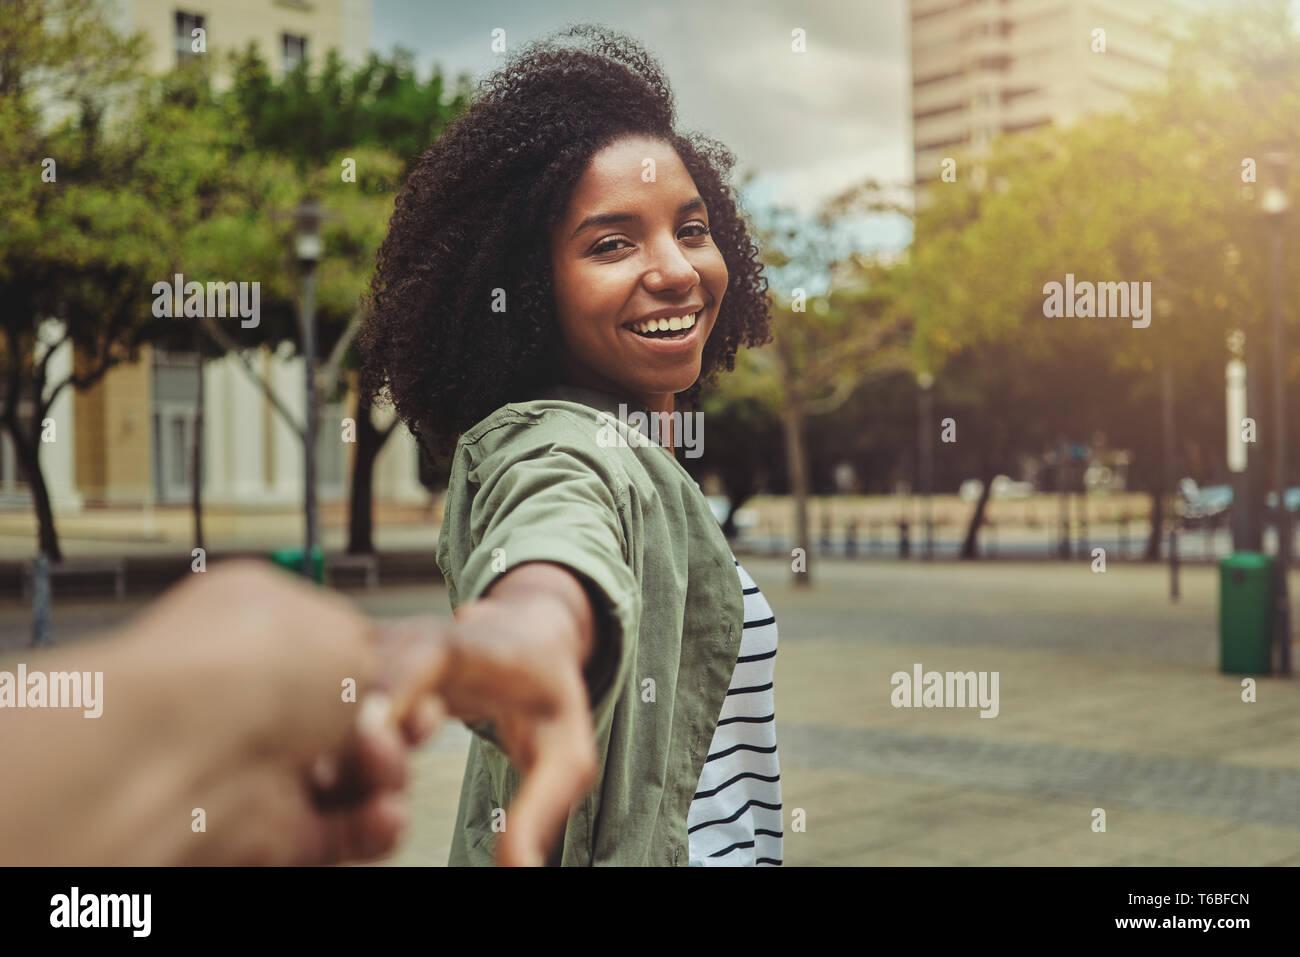 Boyfriend following his happy girlfriend in the city Stock Photo